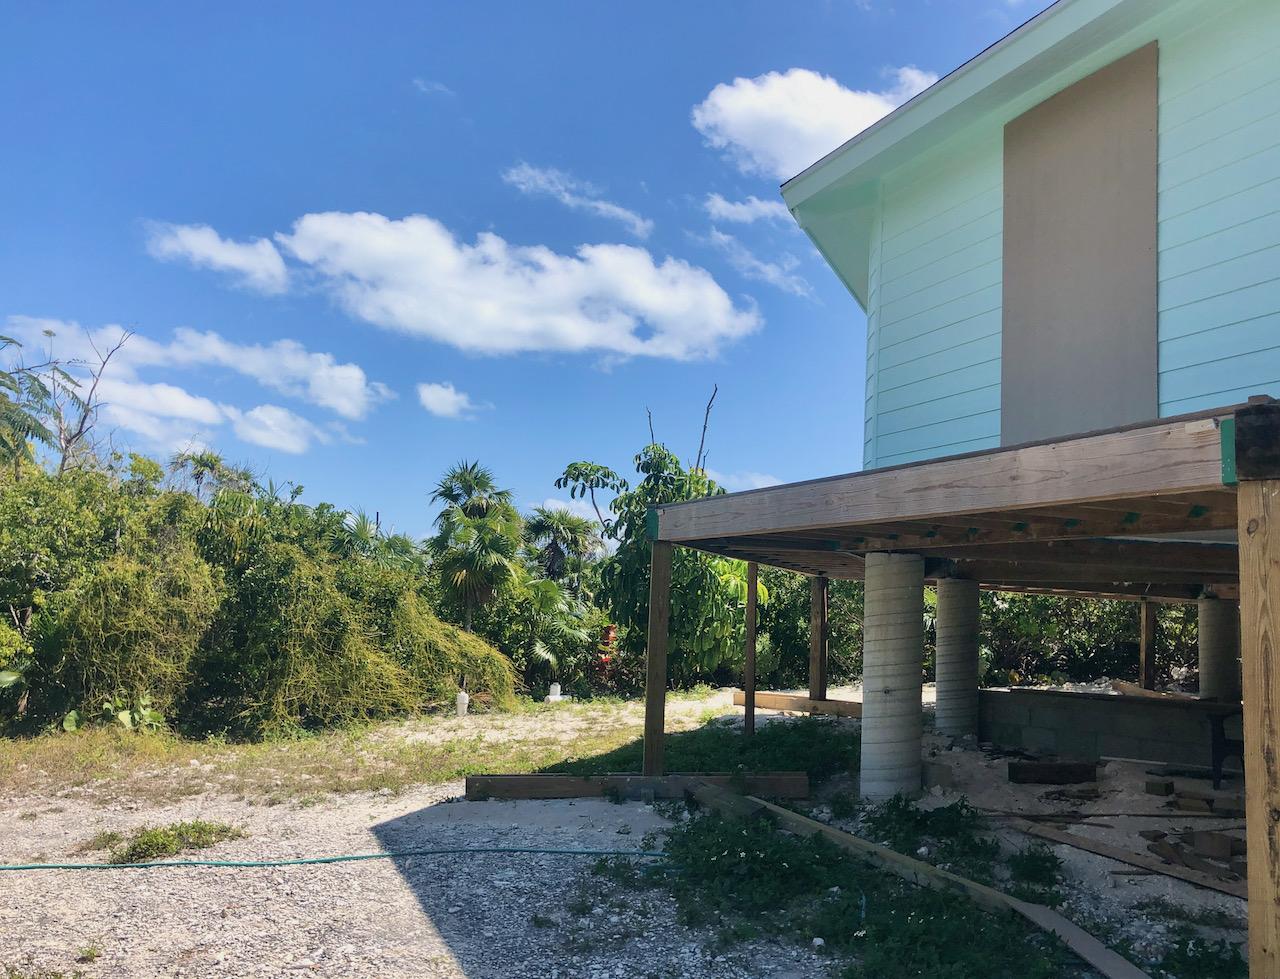 bahama-palm-shores-beachfront-home-for-sale-11